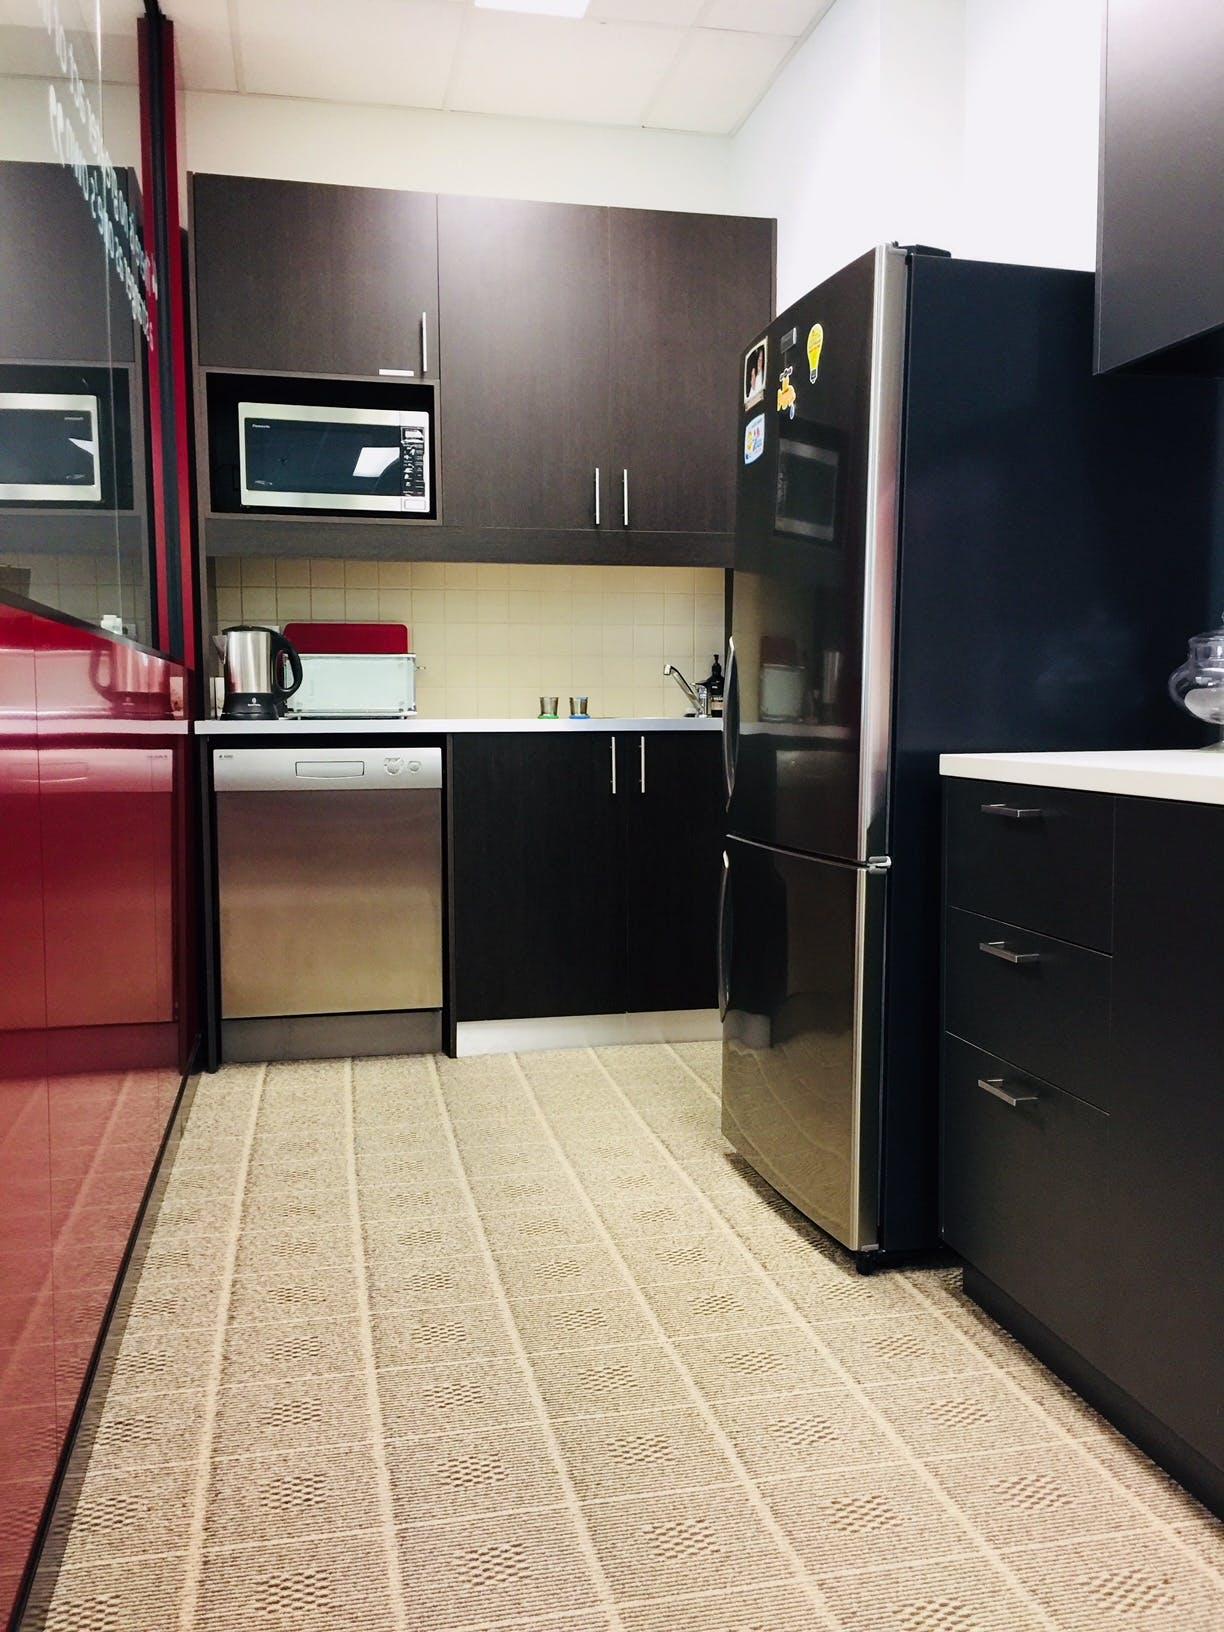 Board Room, meeting room at Brookvale Business, image 6